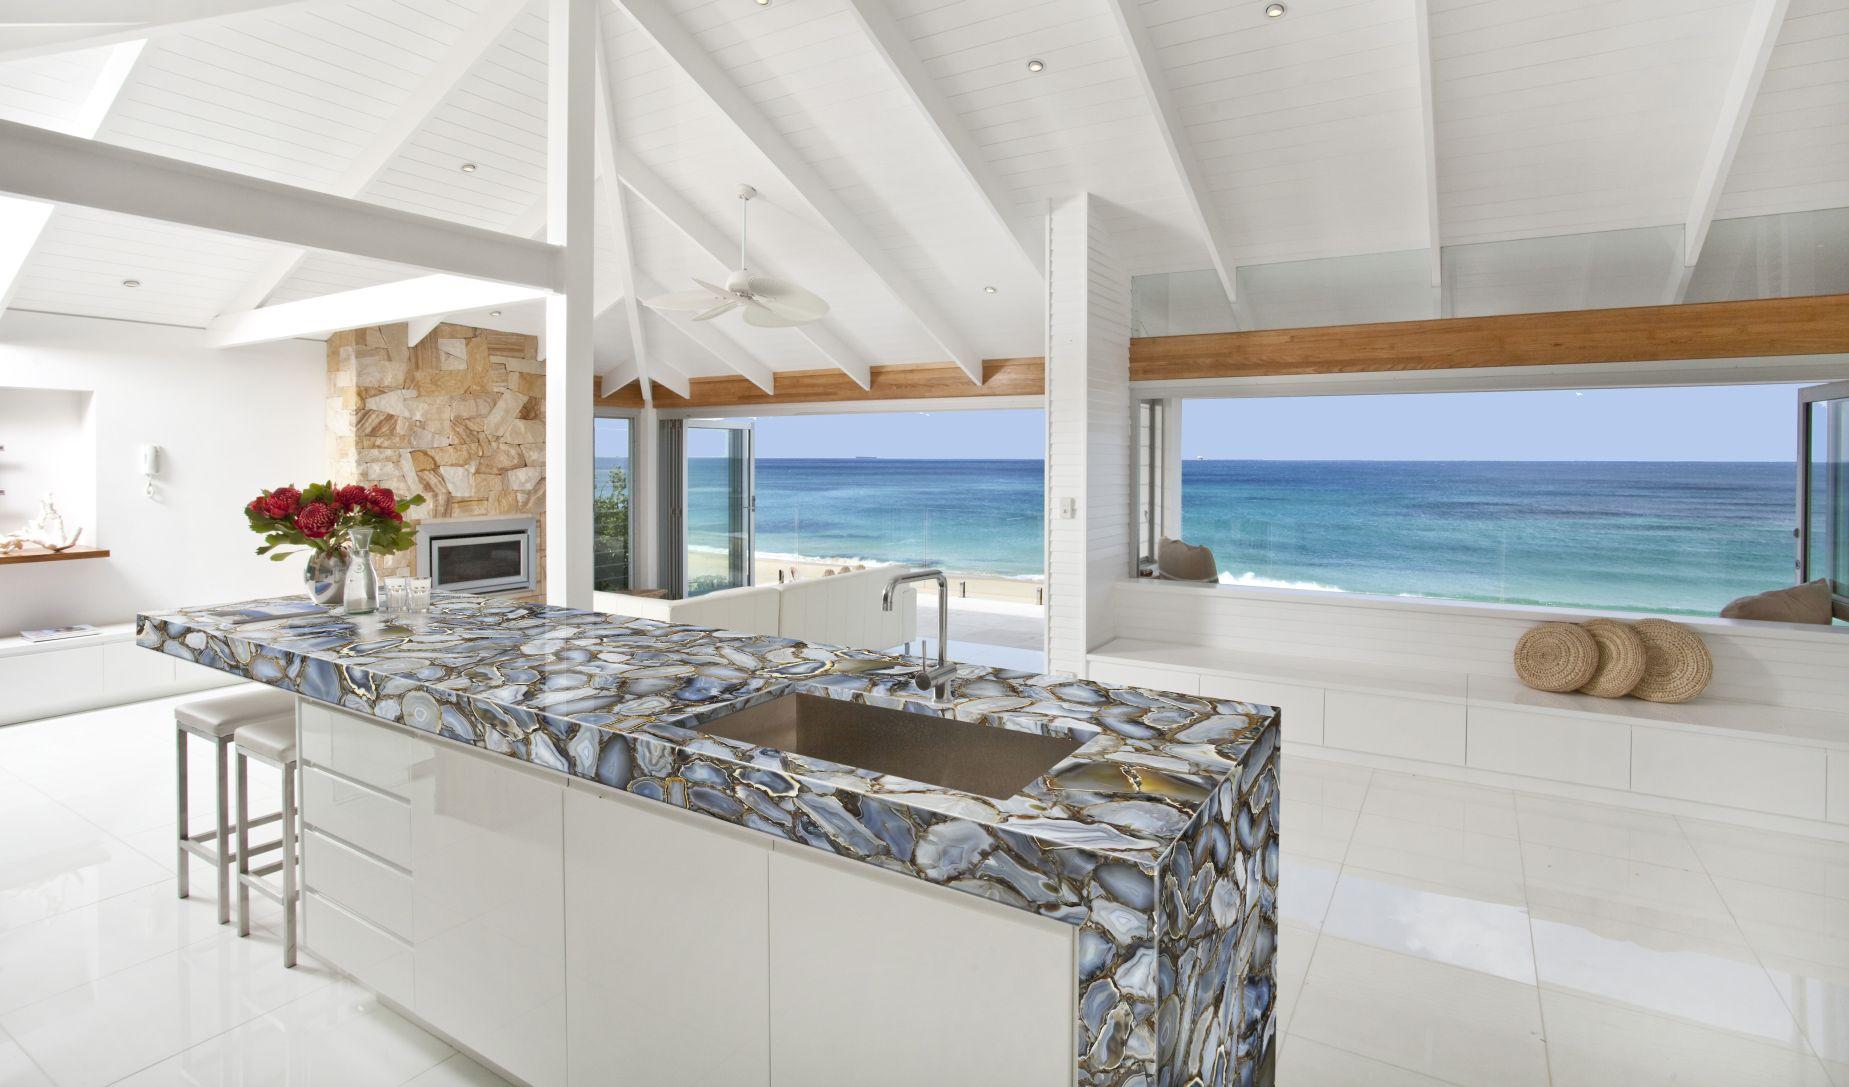 agate rubane kitchen countertops